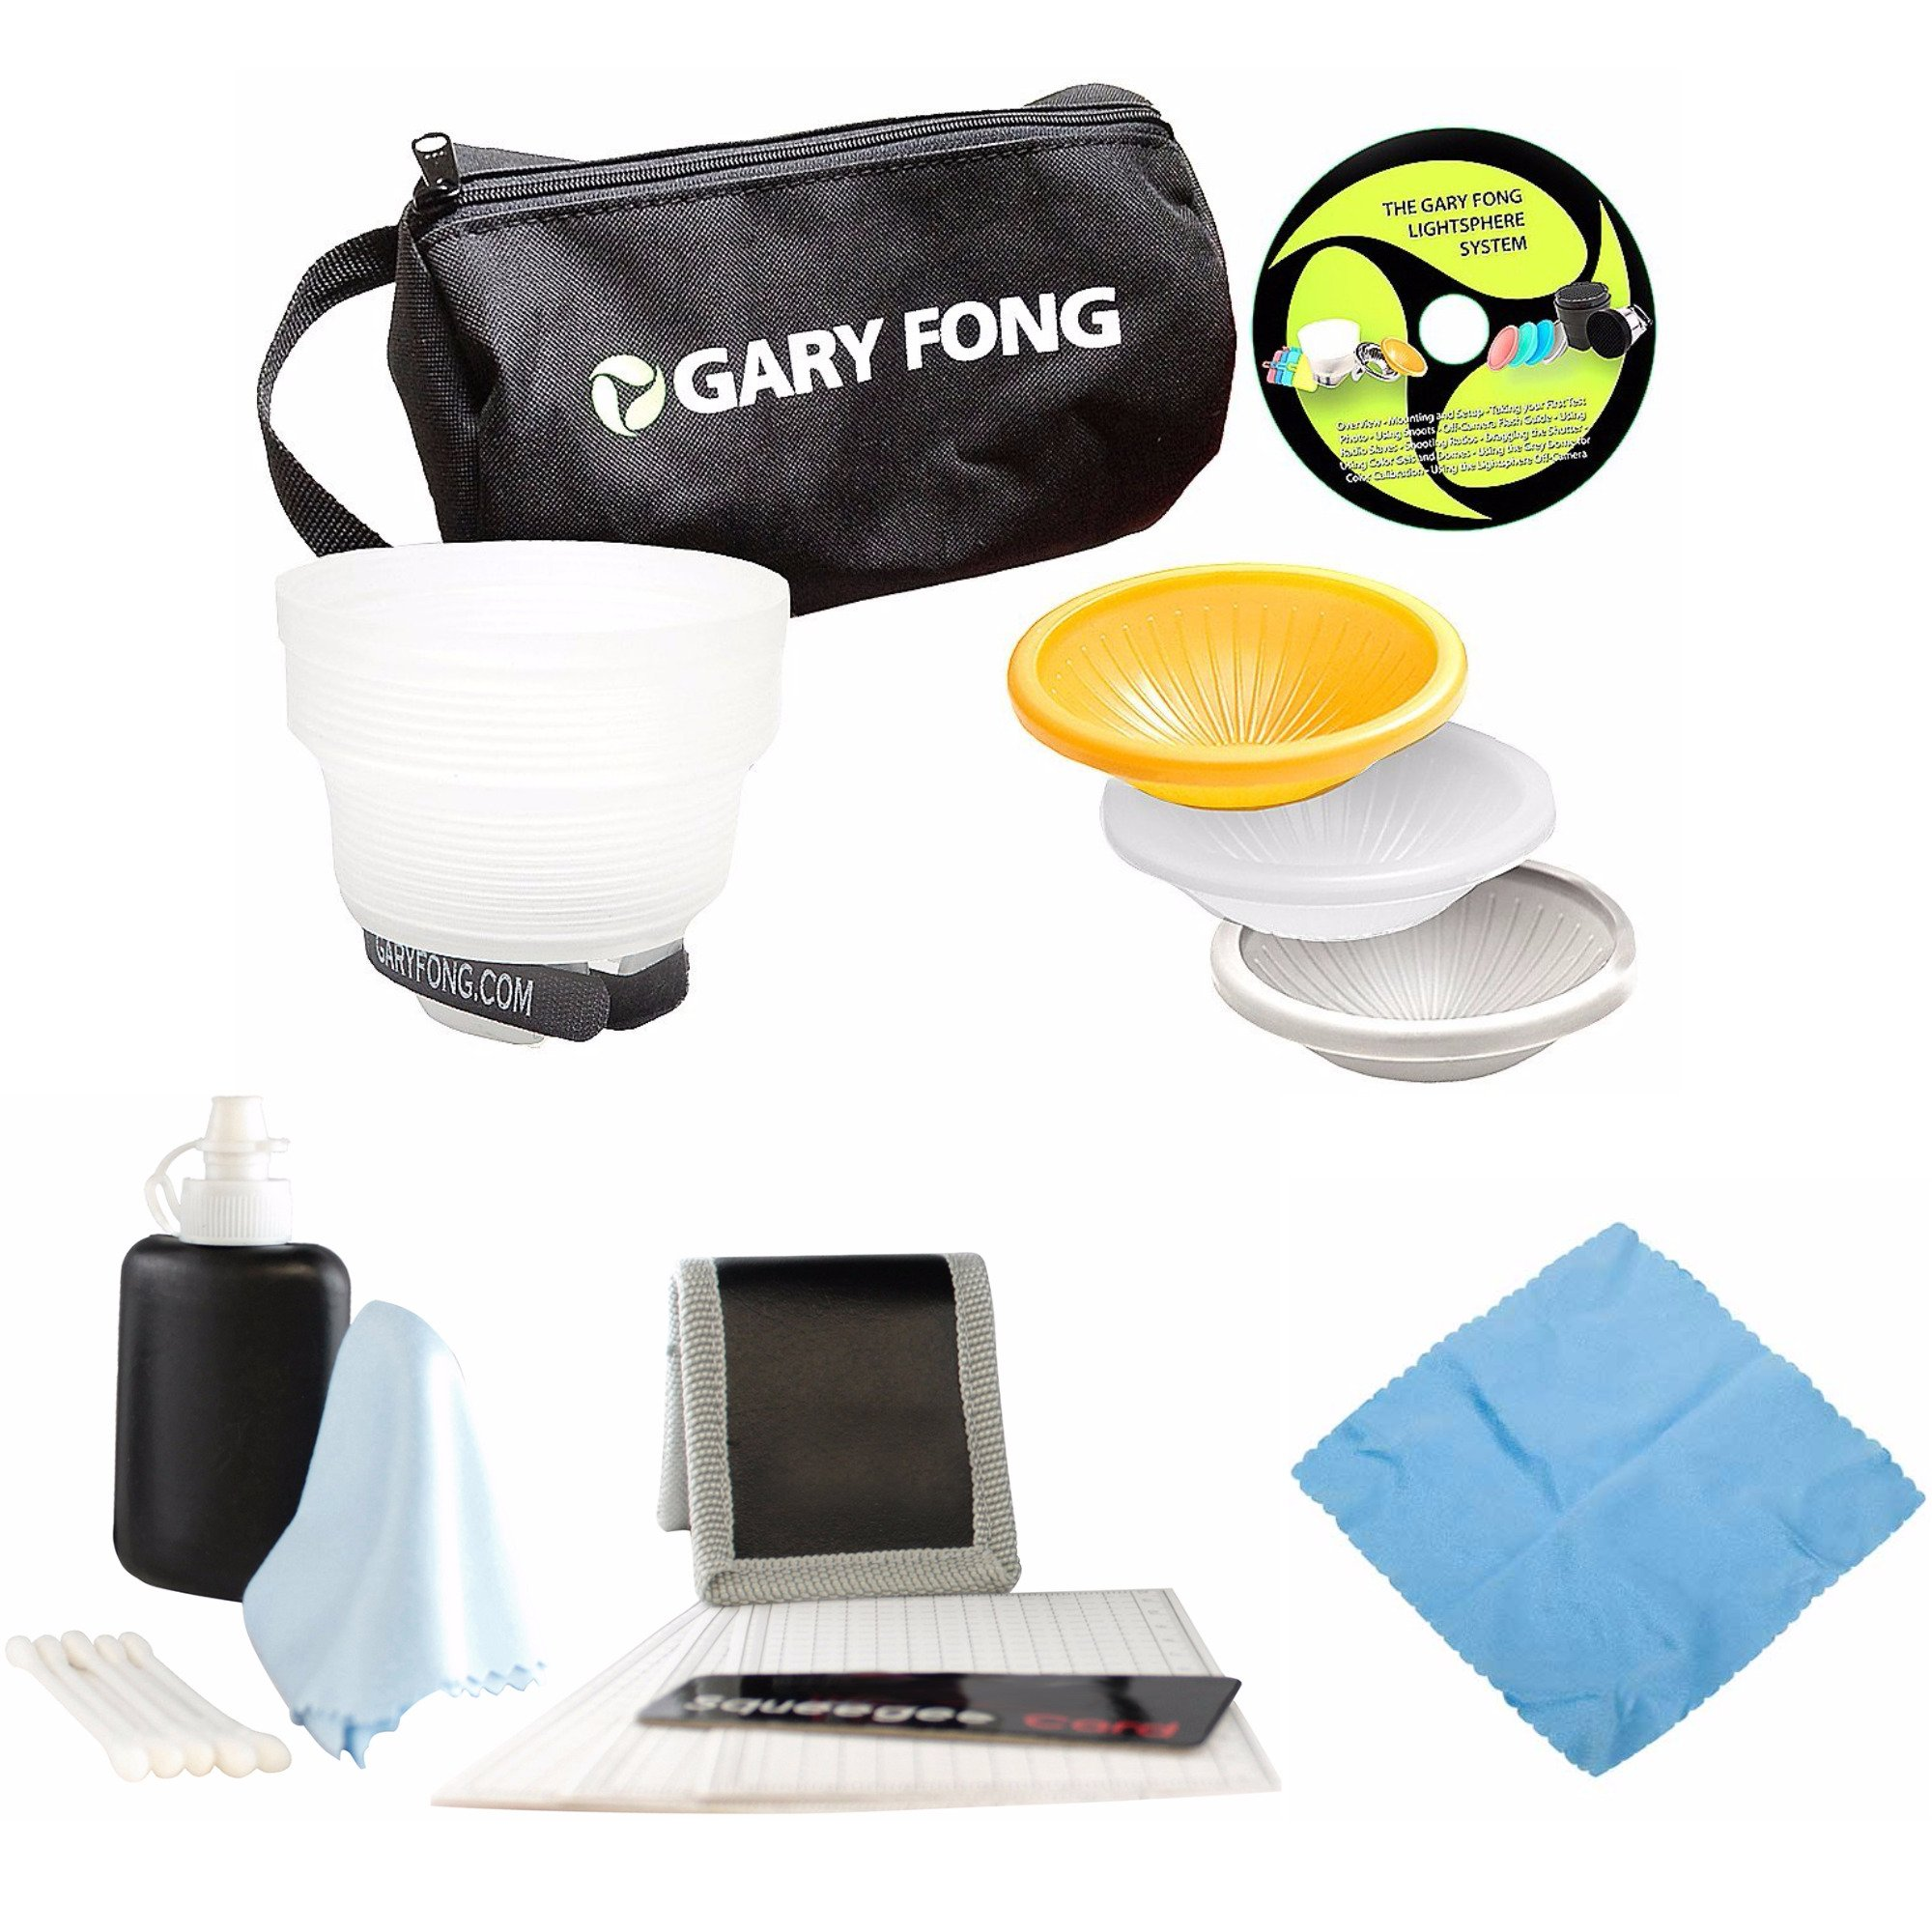 Gary Fong Lightsphere Collapsible Wedding Event Flash Modifying Kit (White/Gray/Amber), Bag & Cleaning Kit